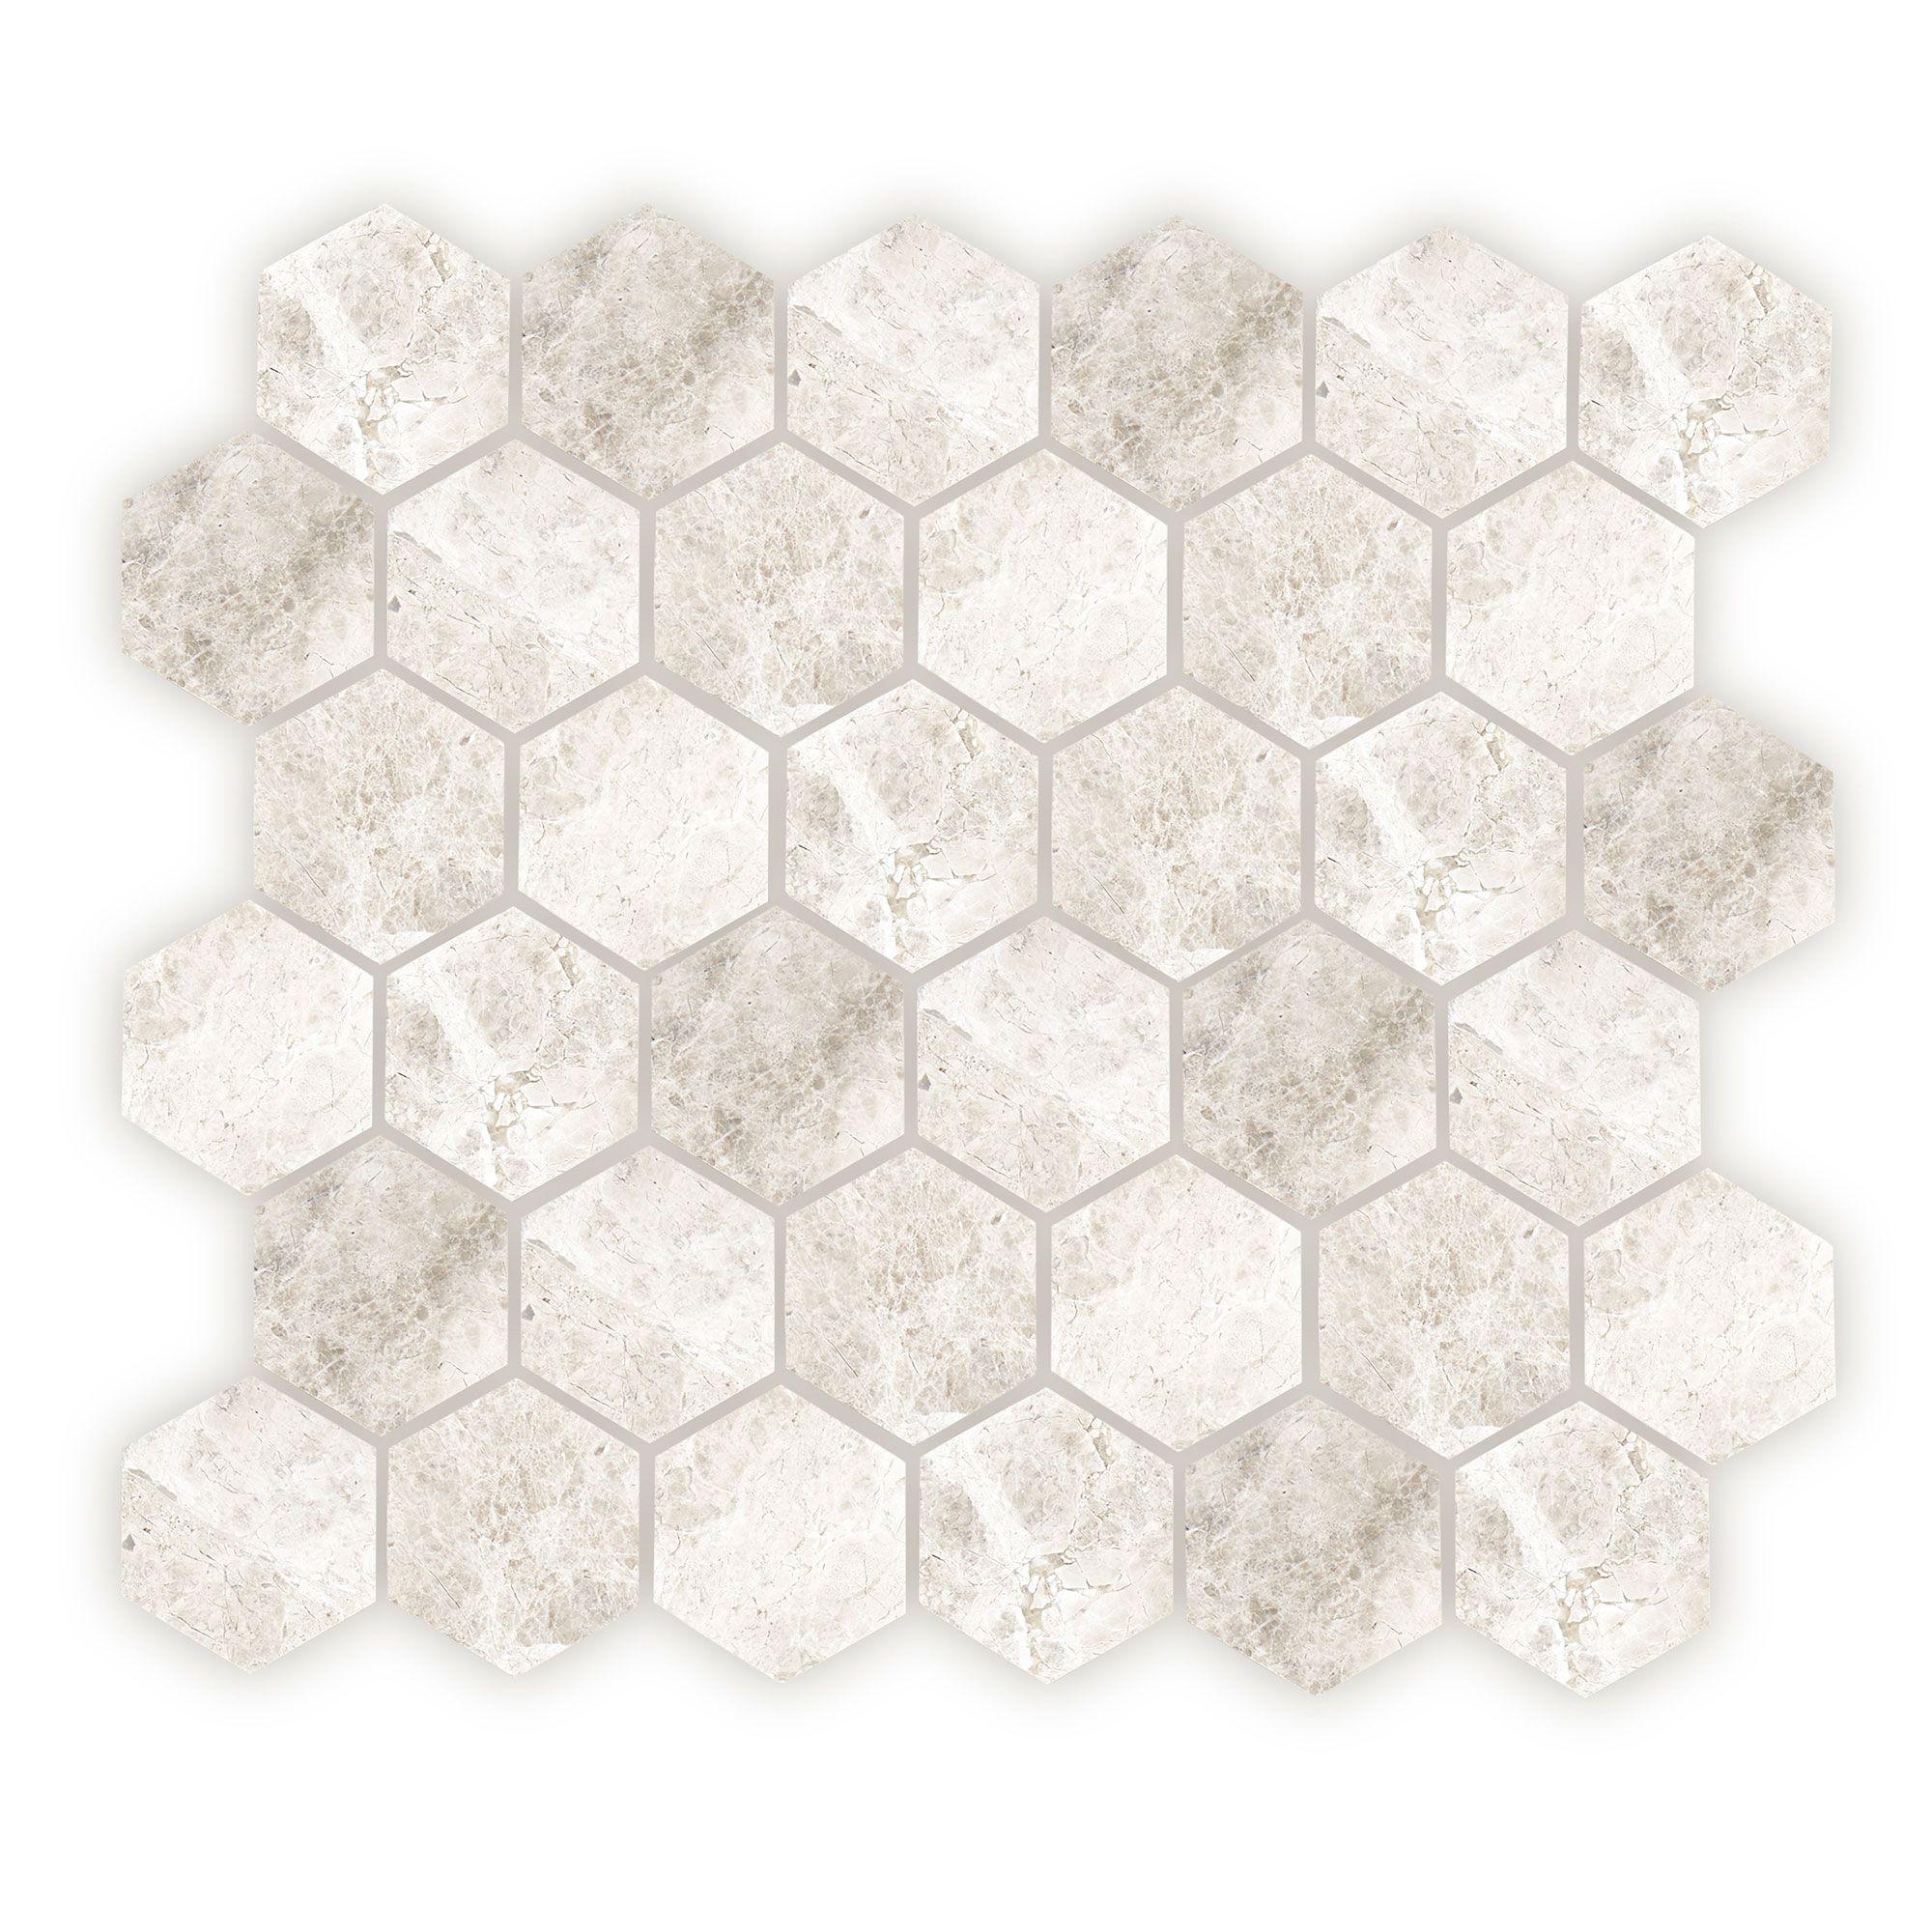 Westhampton Hexagon Mosaic, Honed